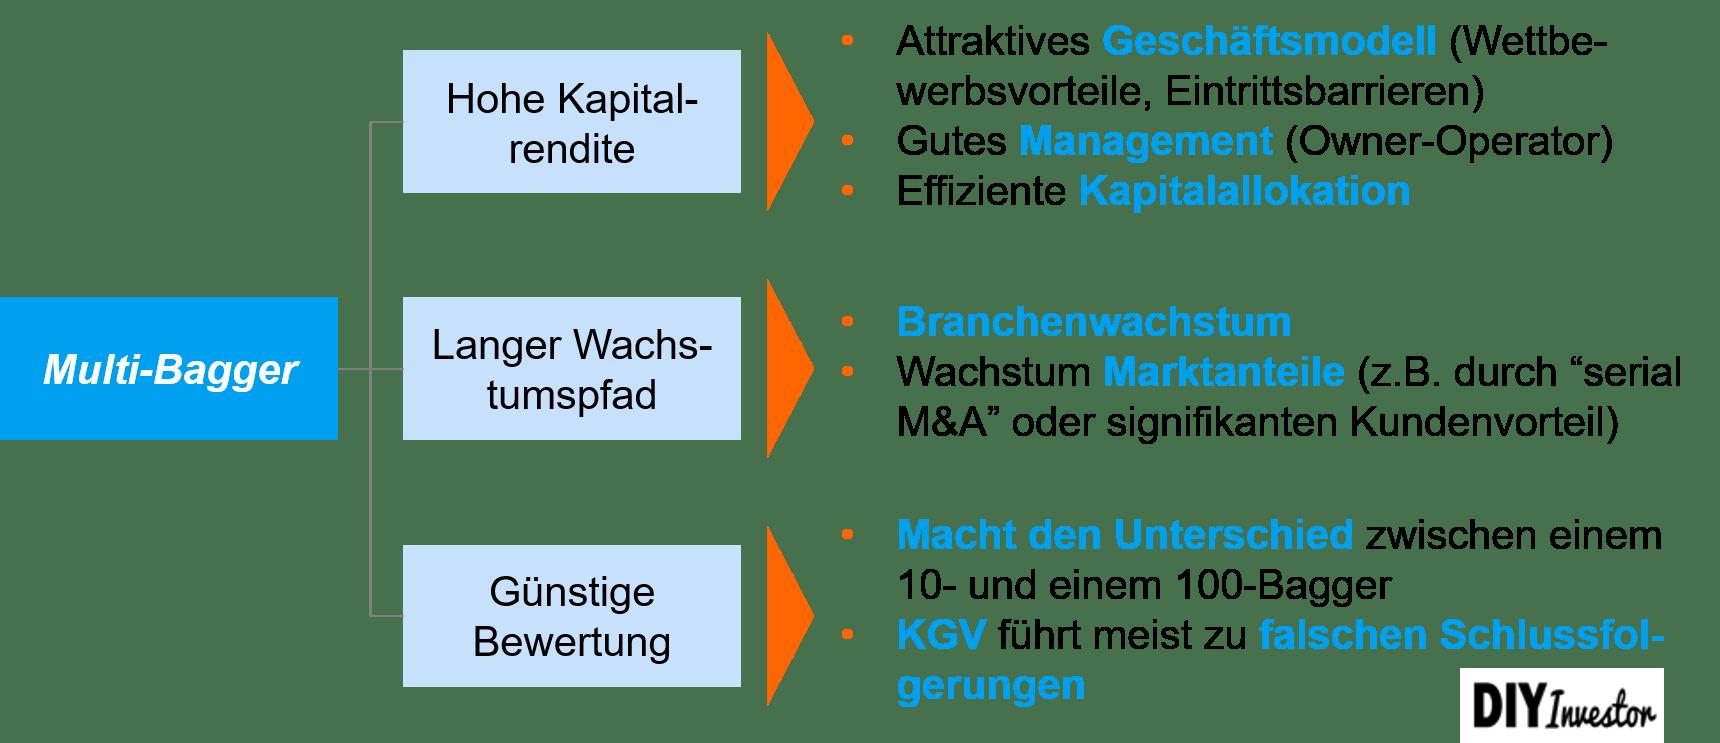 Multi-Bagger Erfolgskriterien